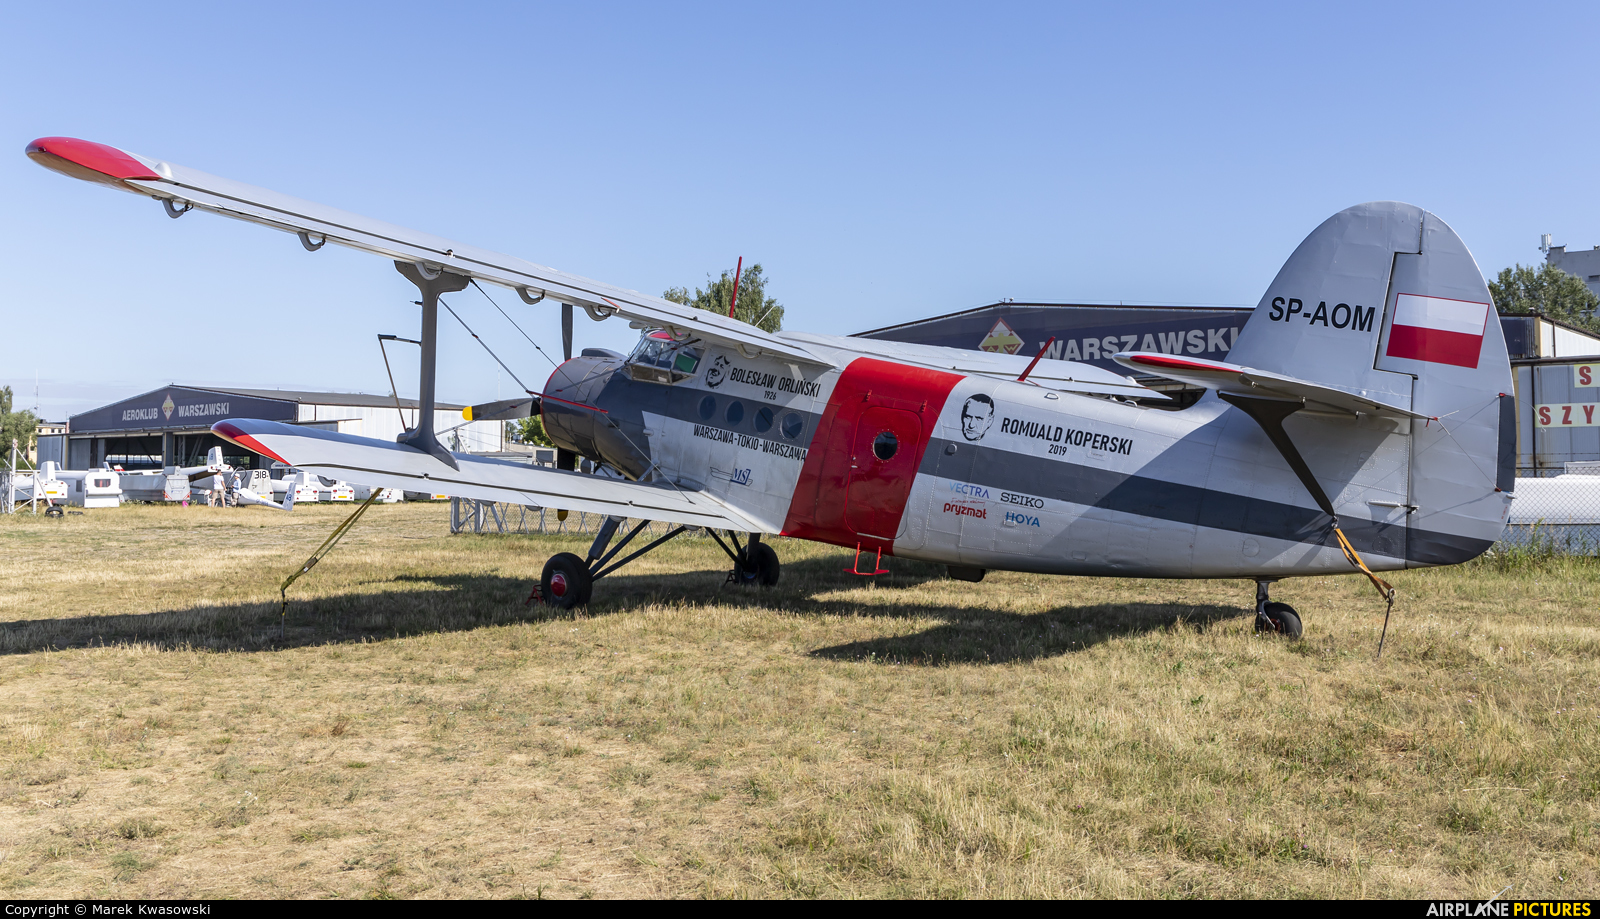 Aeroklub Dolnosląski SP-AOM aircraft at Warsaw - Babice